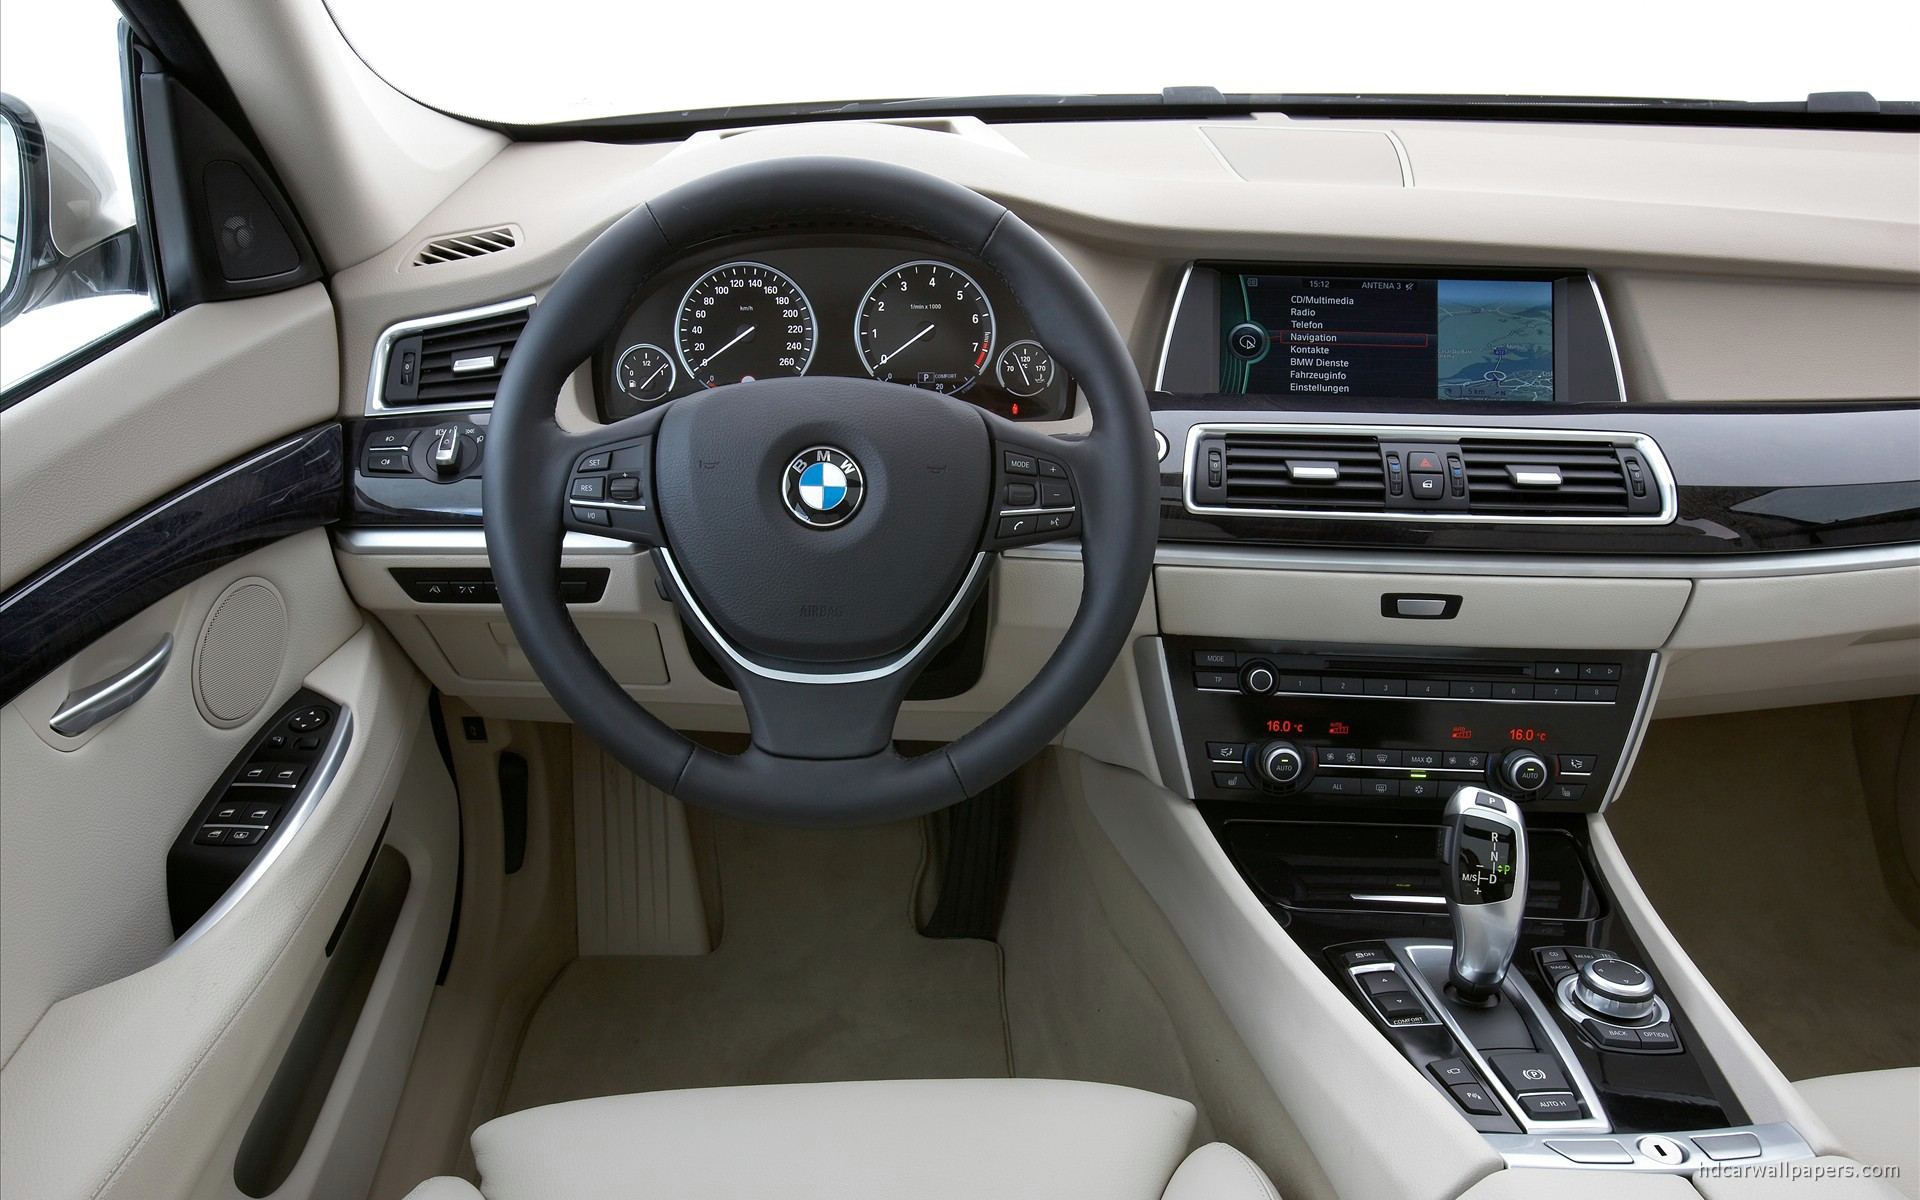 2010 BMW 5 Series Gran Turismo Interior Wallpaper | HD Car Wallpapers